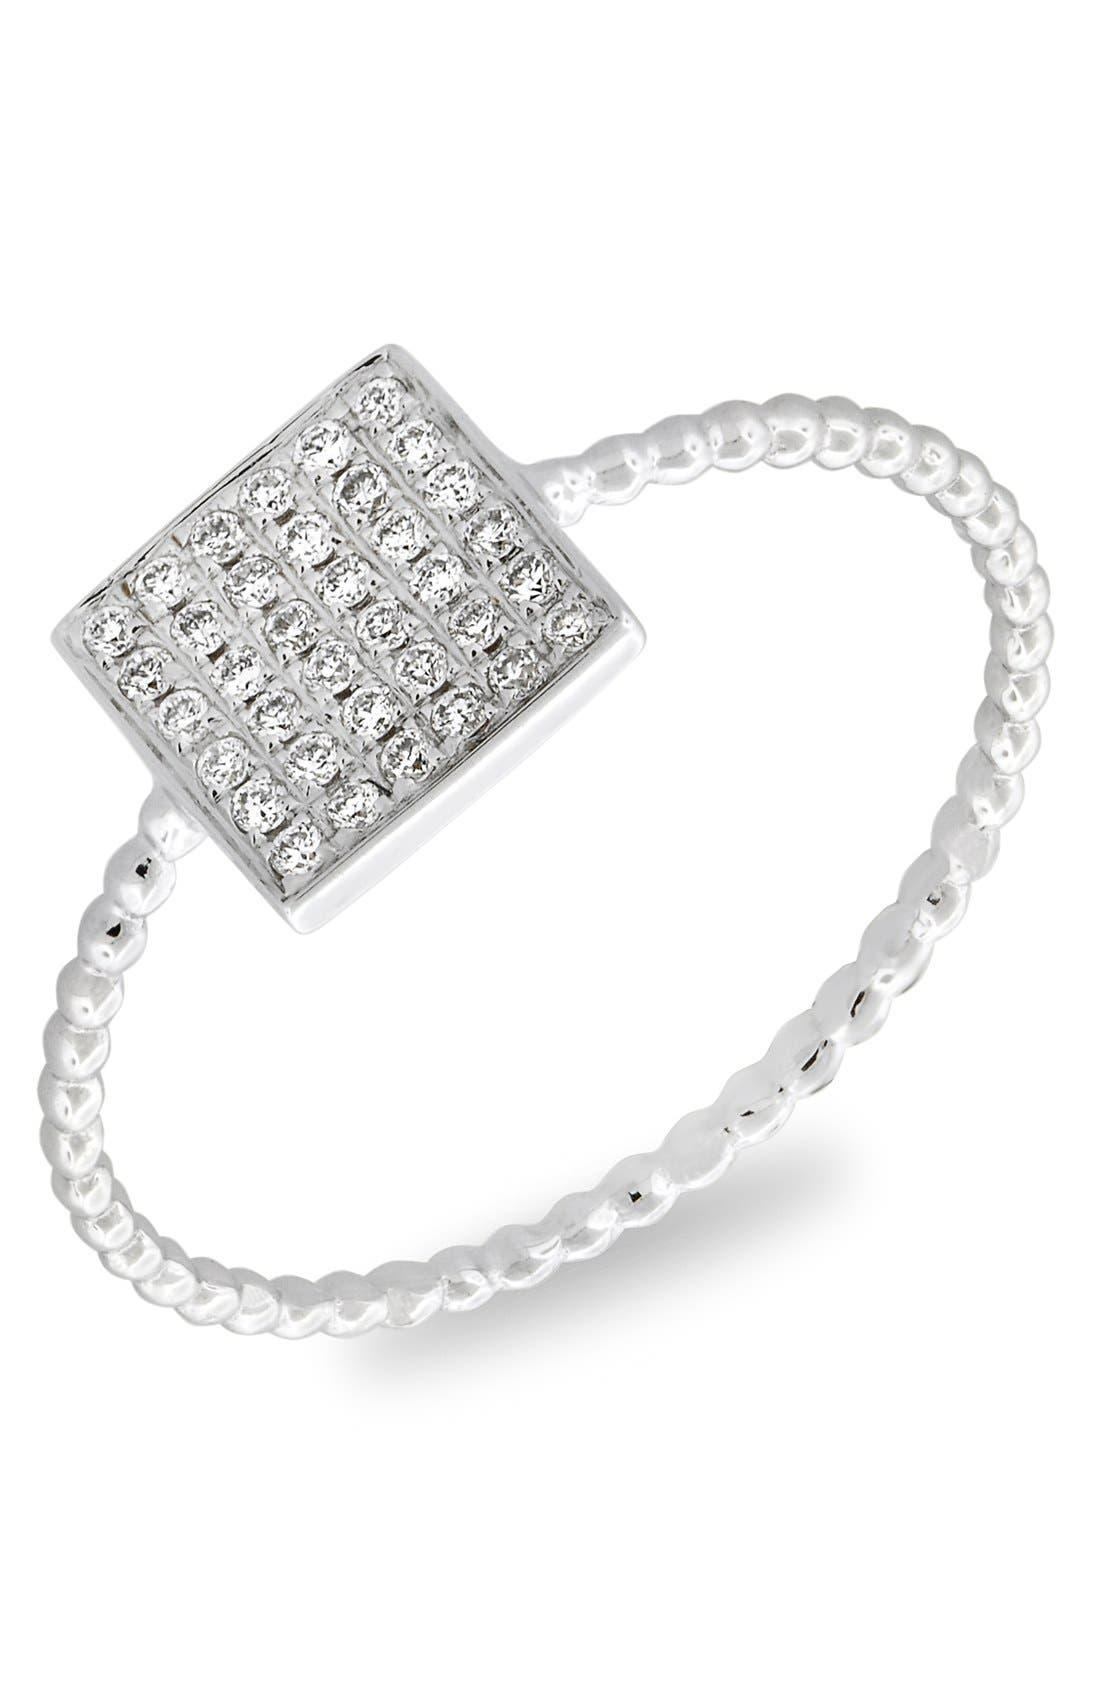 Main Image - Bony Levy Aurora Diamond Pavé Square Ring (Nordstrom Exclusive)